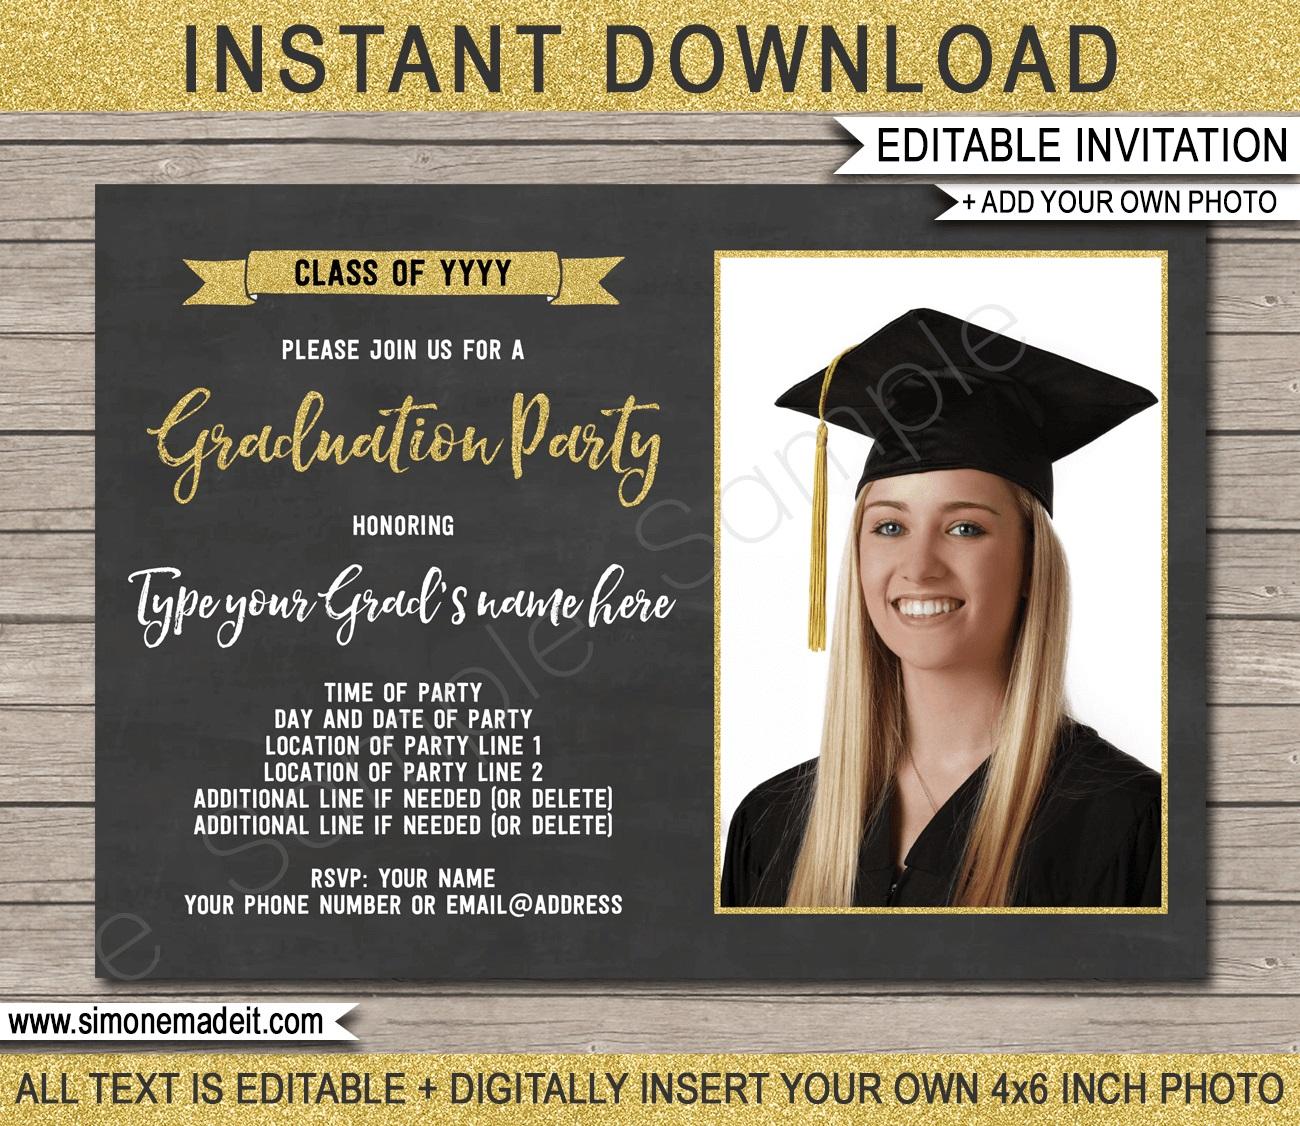 009 Stirring Graduation Party Invitation Template High Definition  Microsoft Word 4 Per PageFull